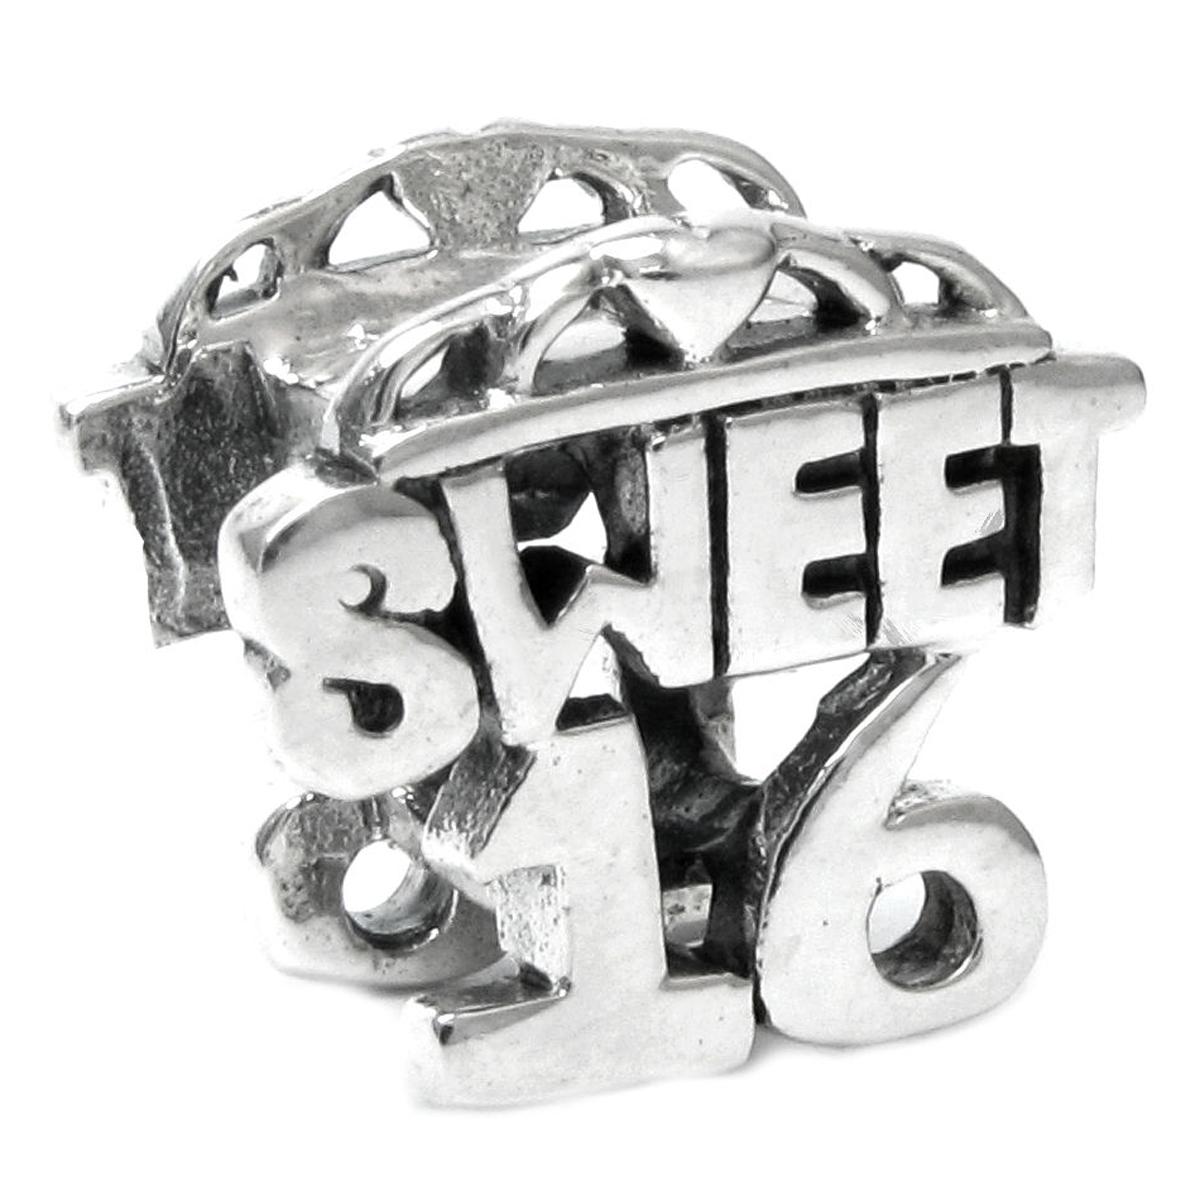 56ca35876 Sterling Silver Sweet 16 Sixteen Birthday Heart Love Bead For Pandora Troll  Chamilia Biagi European Charm Bracelets